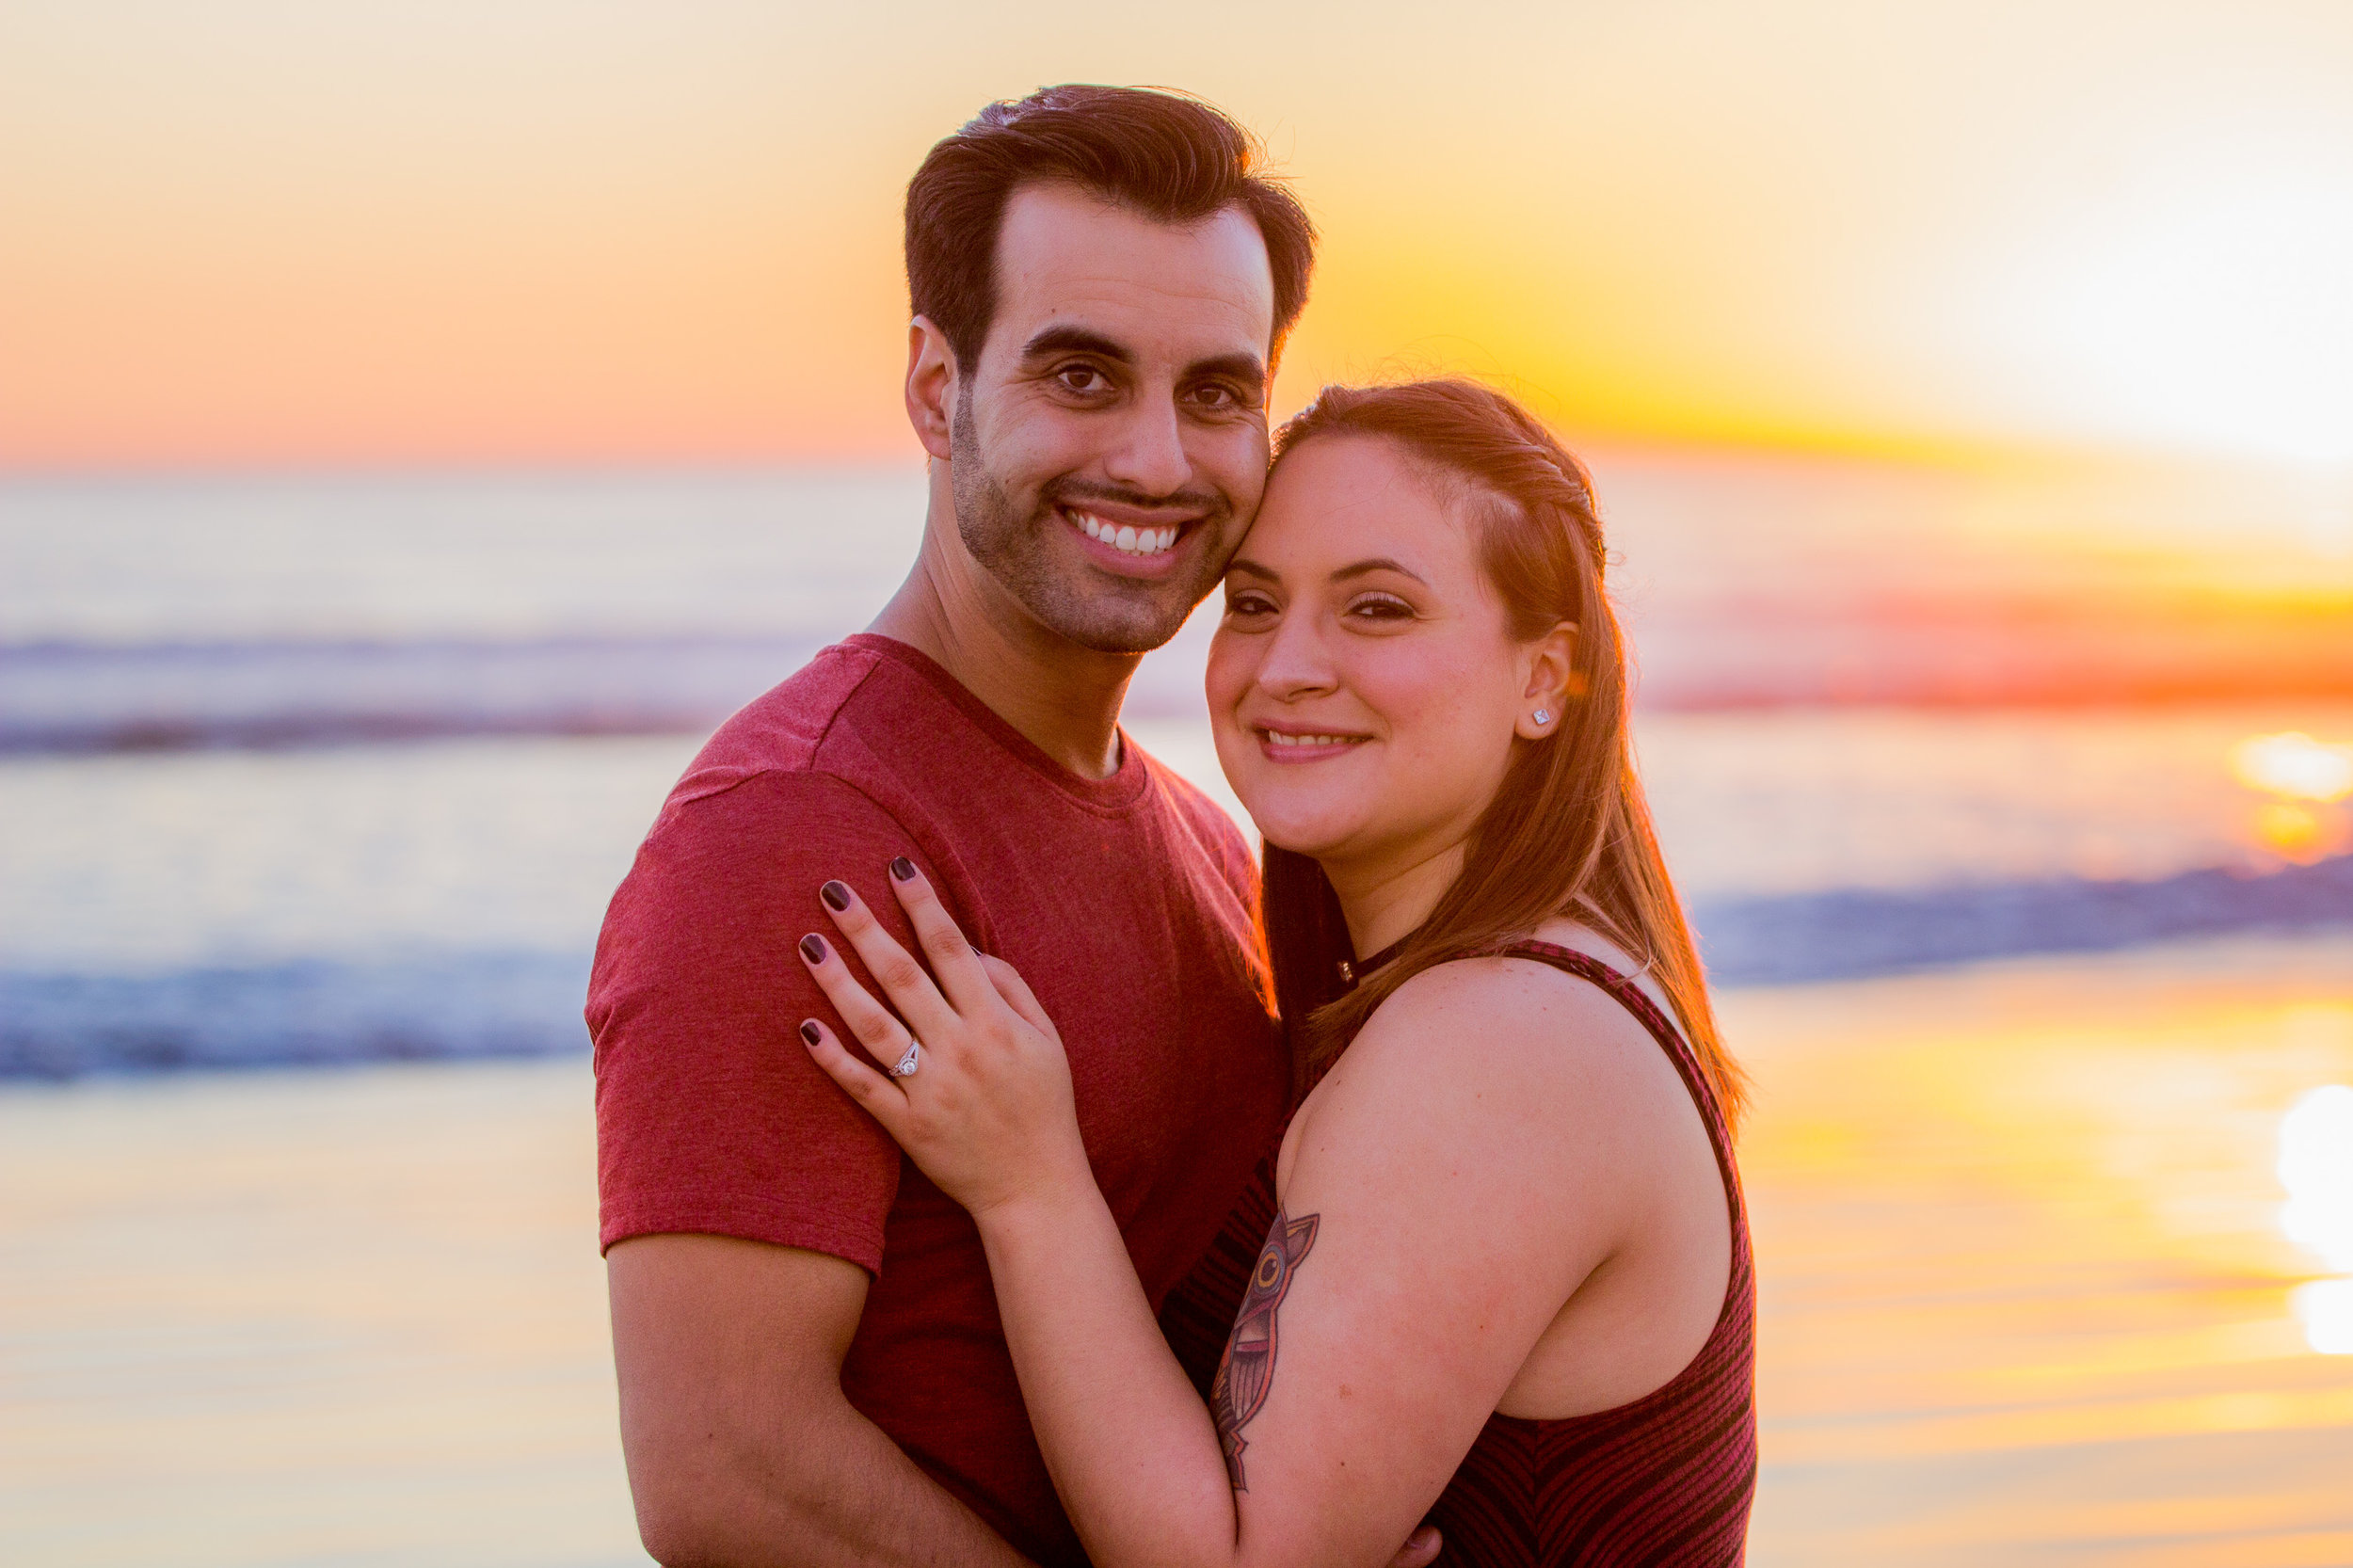 coronado-beach-california-sunset-engagement-session-black-and-white-photos-san-diego-wedding-photography